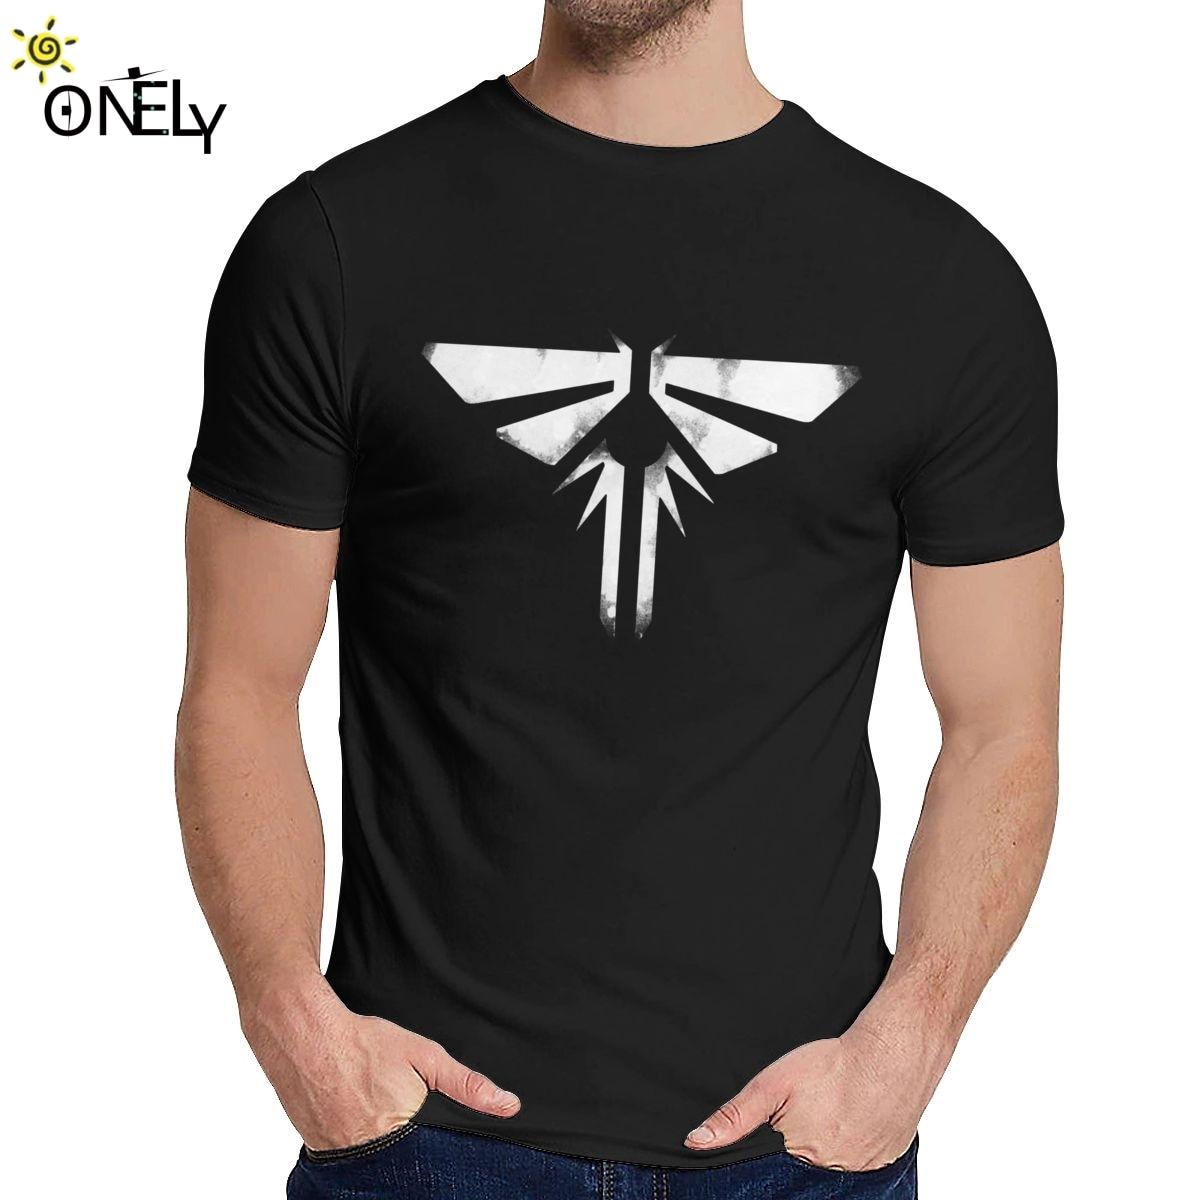 Camiseta de manga corta con Logo de Fireflies, cuello redondo, estampado gráfico,...